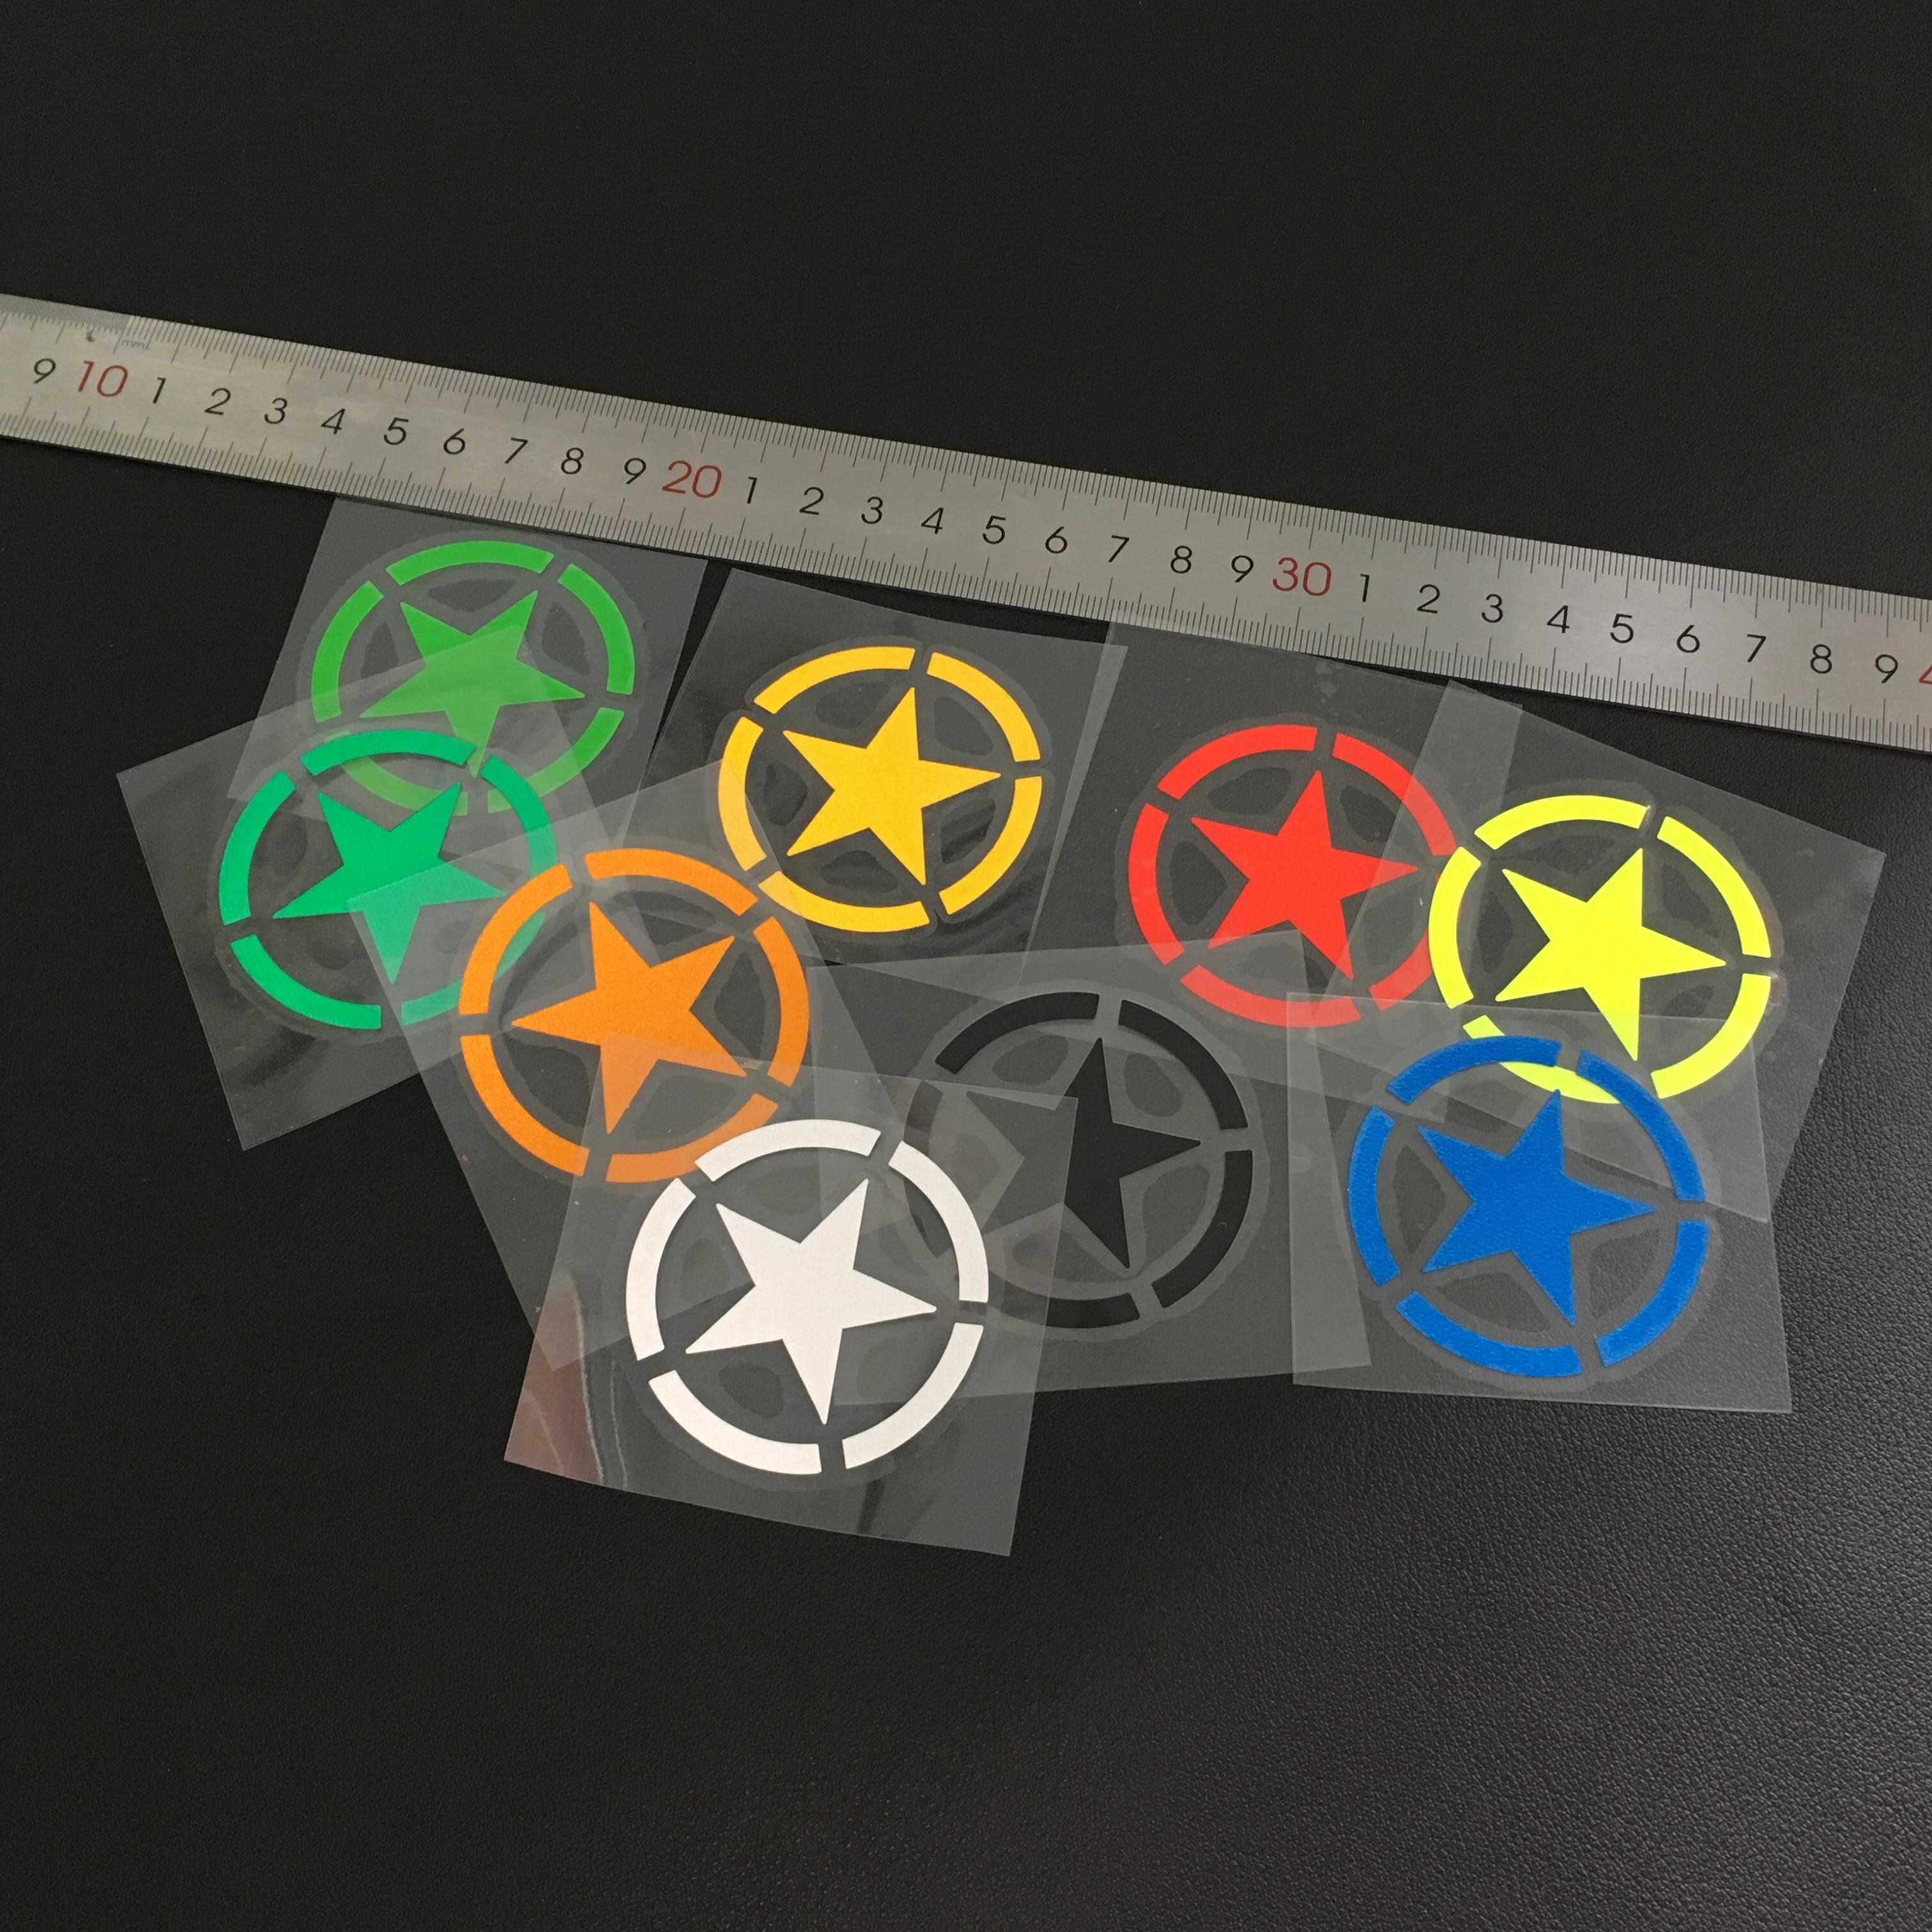 GalonDeco Reflective Army Stars Motorcycle Safety Stickers Decals Helmet DIY Sticker MOTO GP Fans Cars Sticker Decals